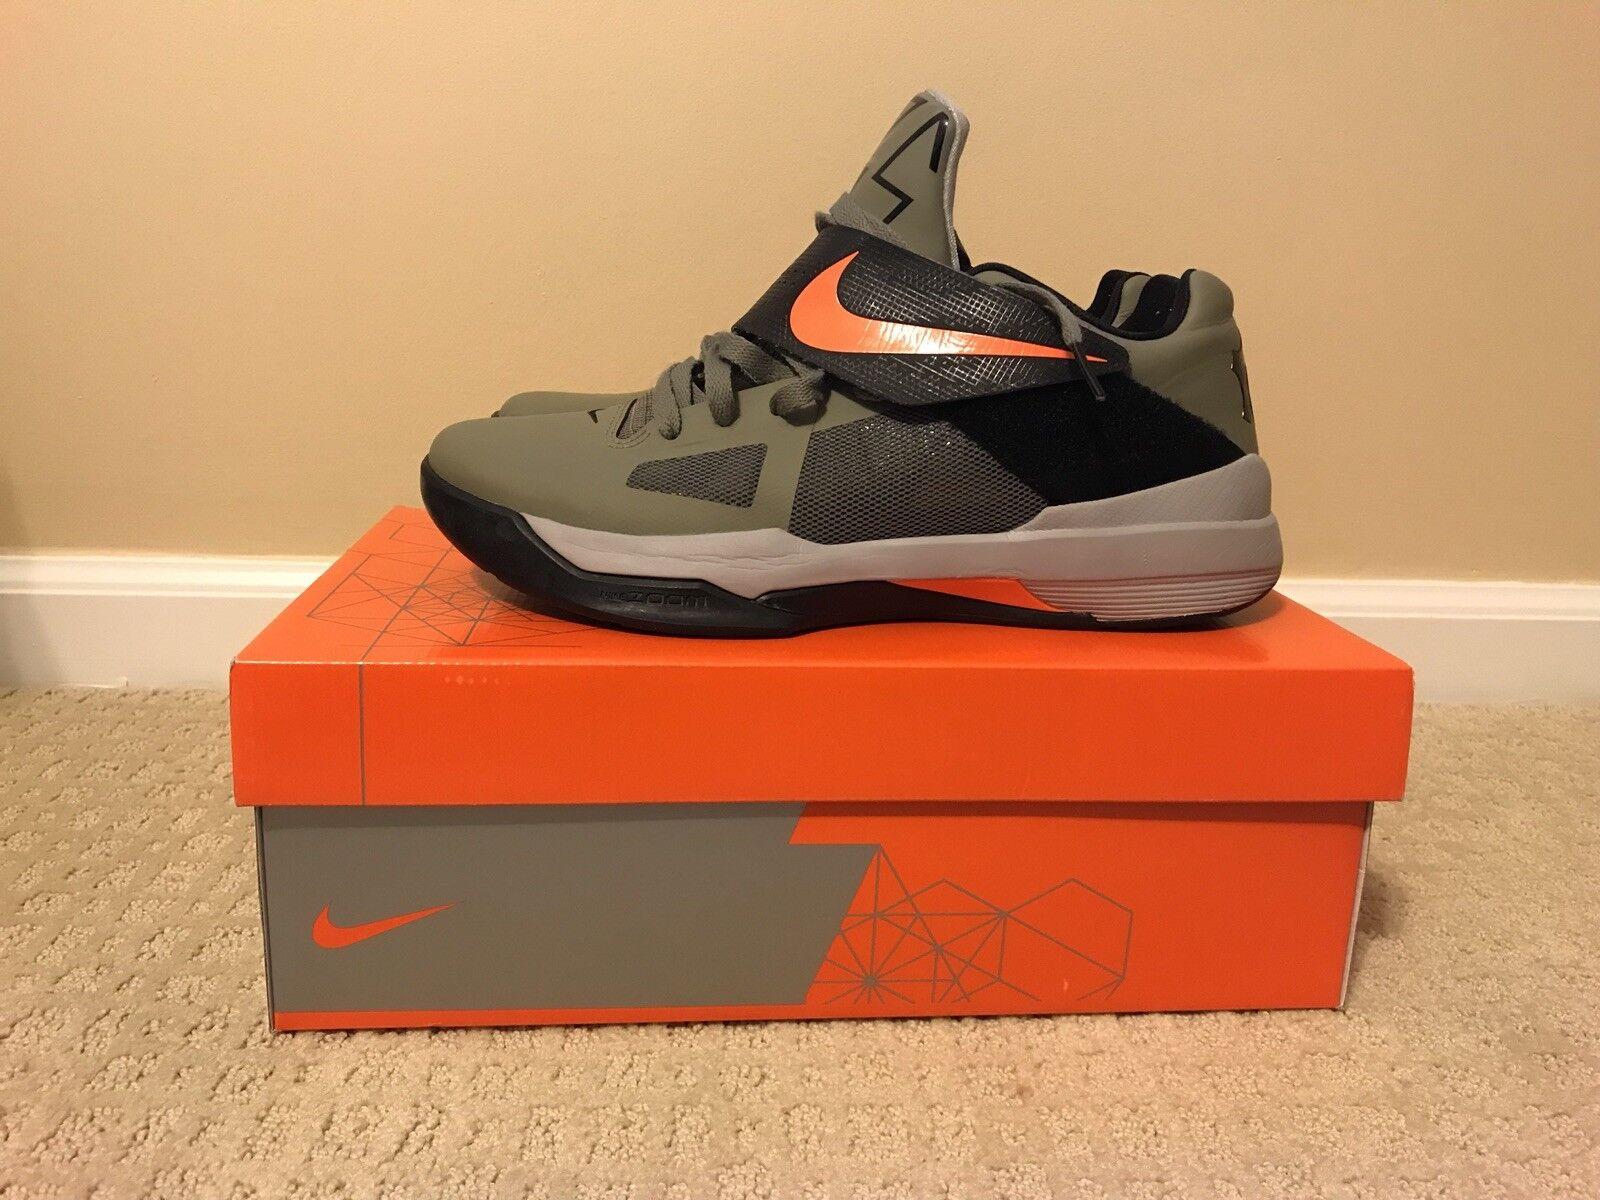 Nike kevin durant 4 unbesiegte sz 9,5